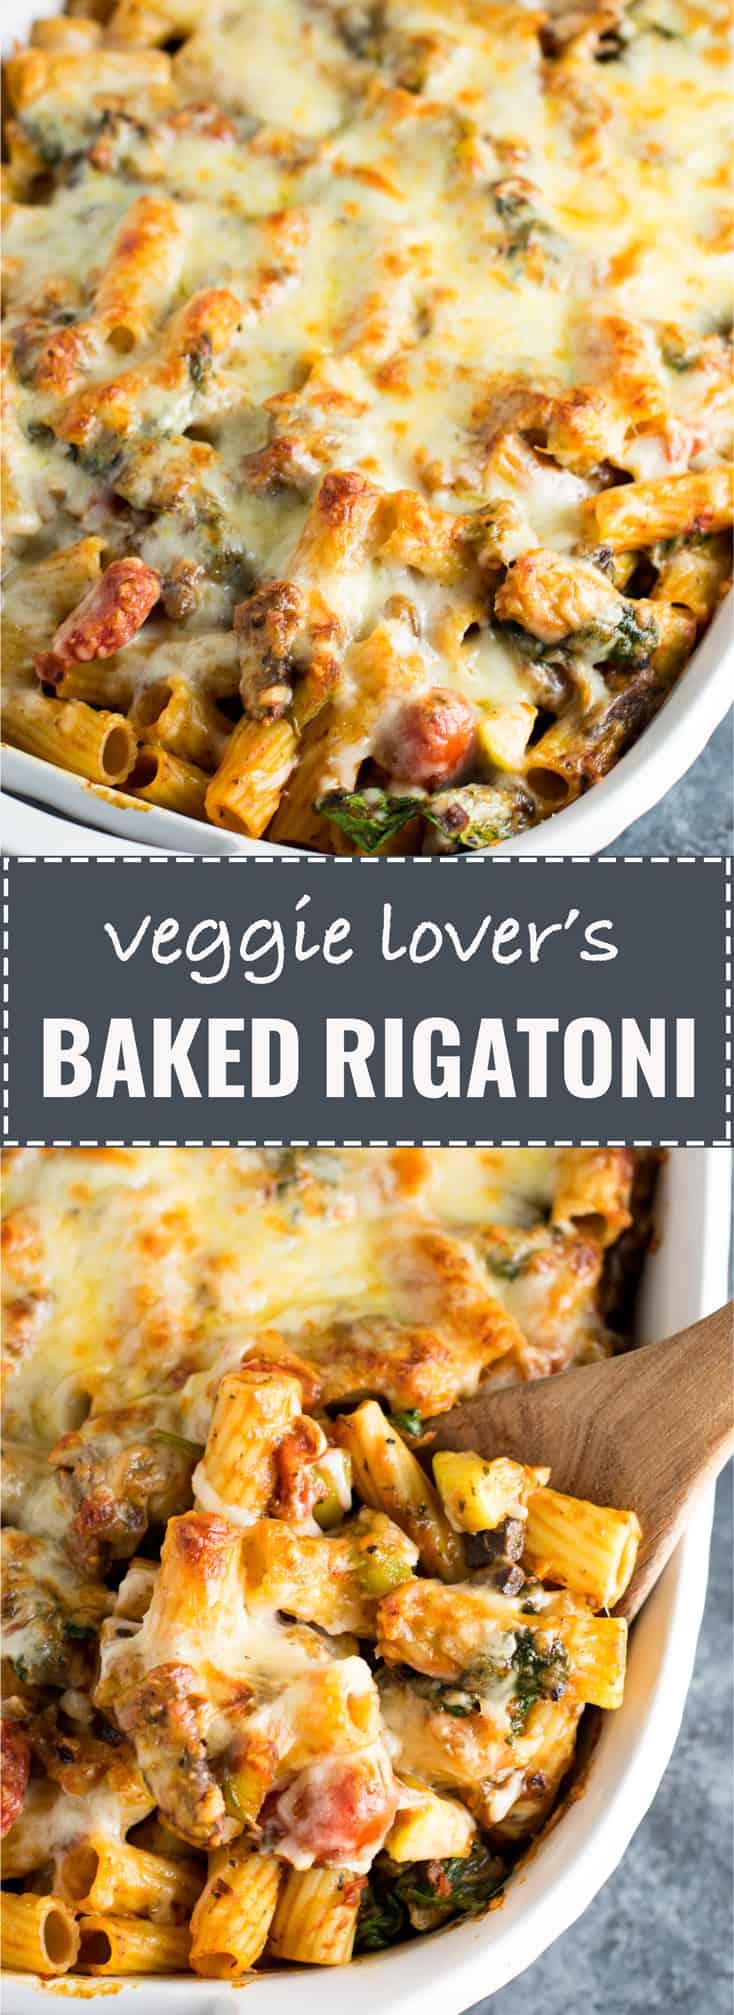 veggie lover's baked rigatoni - #vegetarian #pastabake #rigatoni #veggielovers